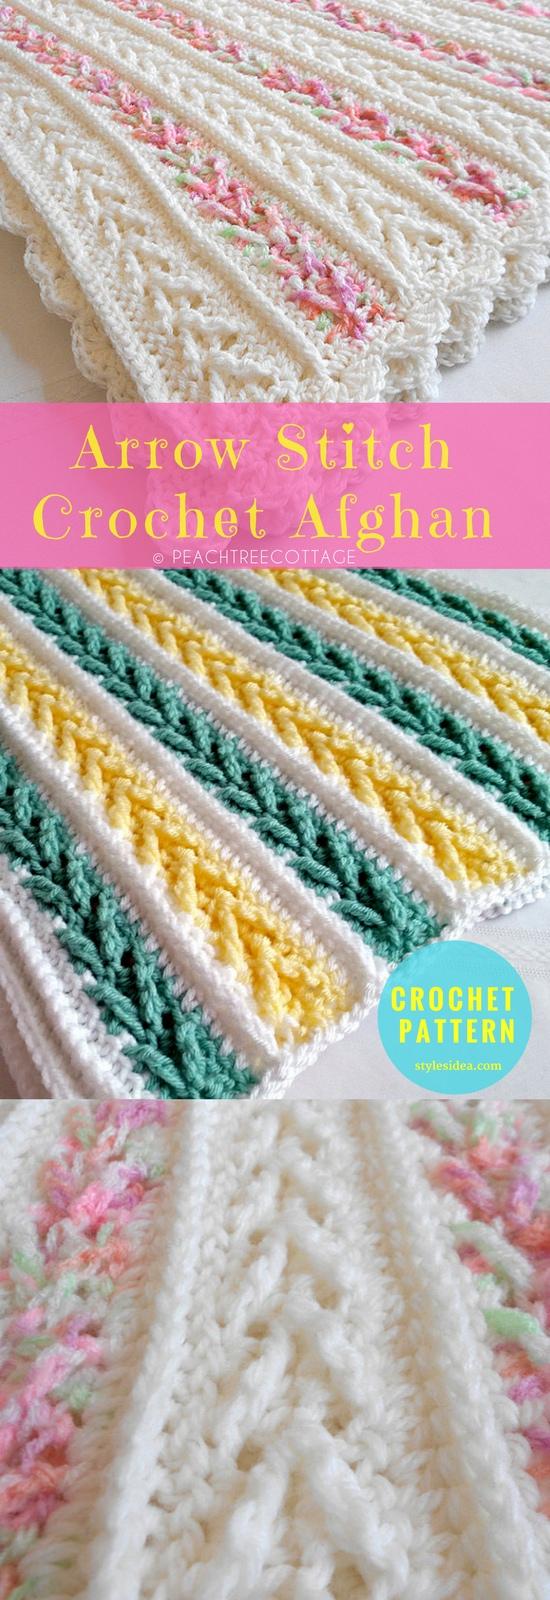 Arrow Stitch Crochet Afghan Free Crochet Pattern New Craft Works